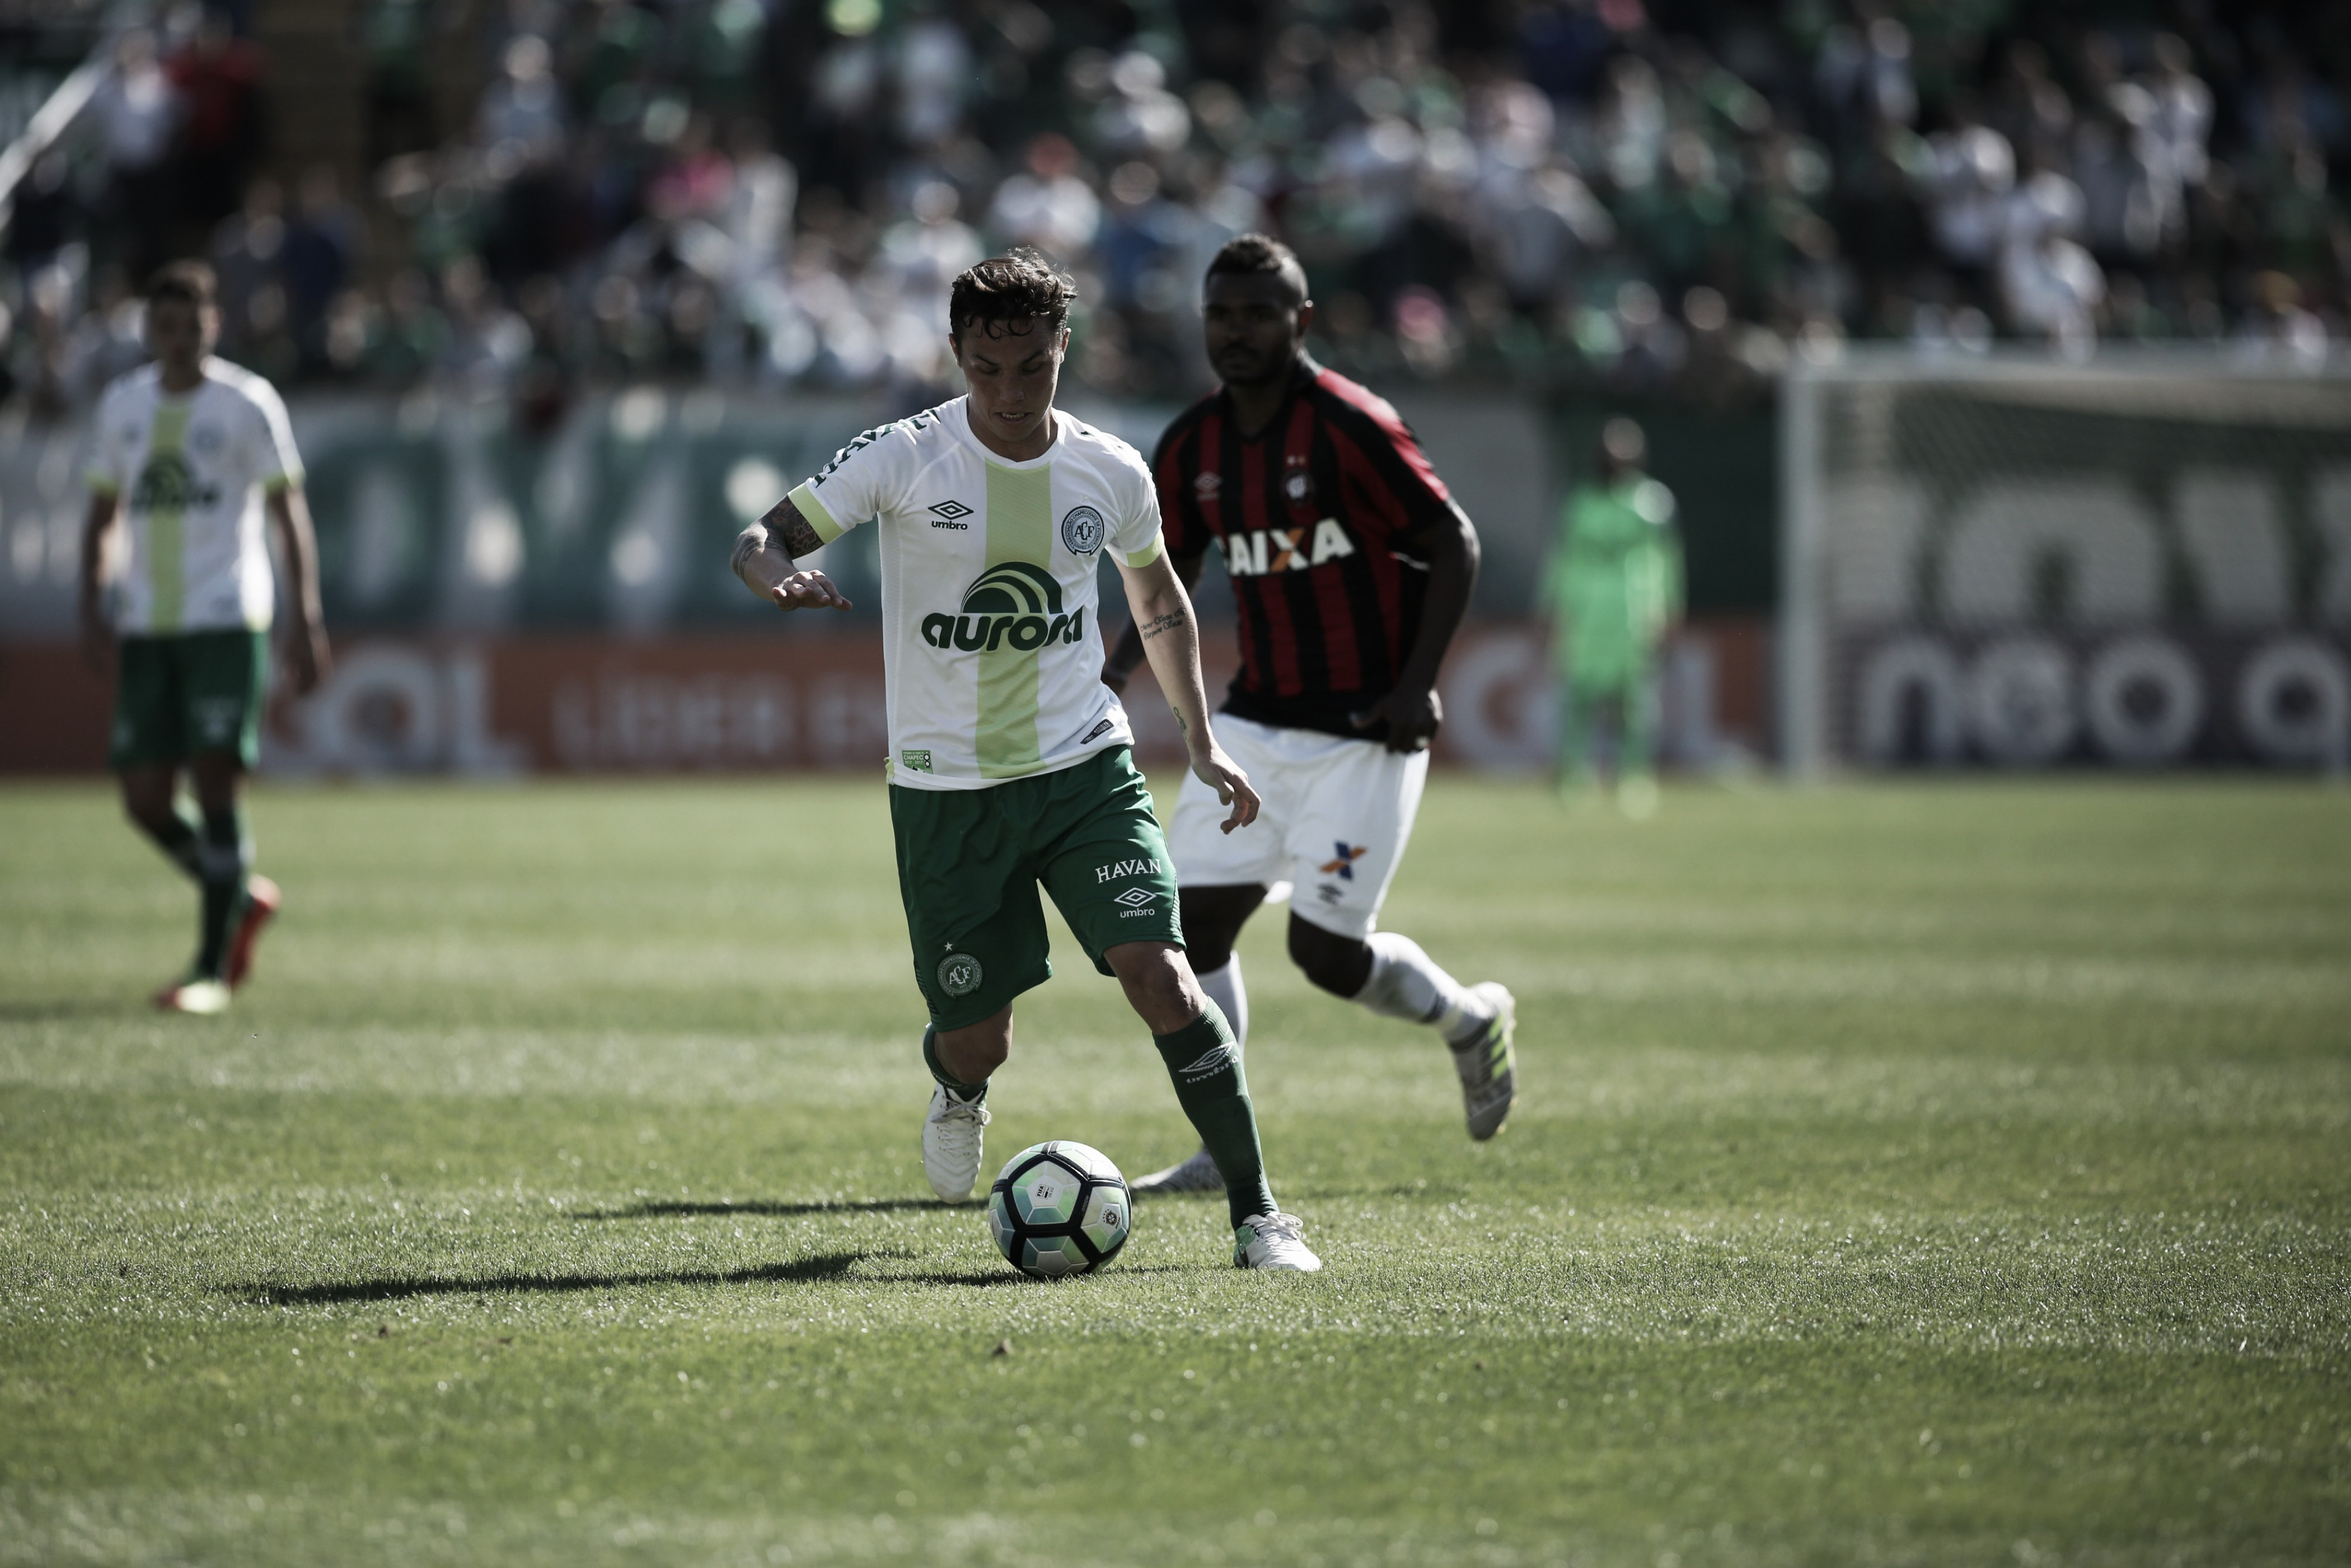 Em fase delicada, Chapecoense cumpre jogo atrasado contra Atlético-PR